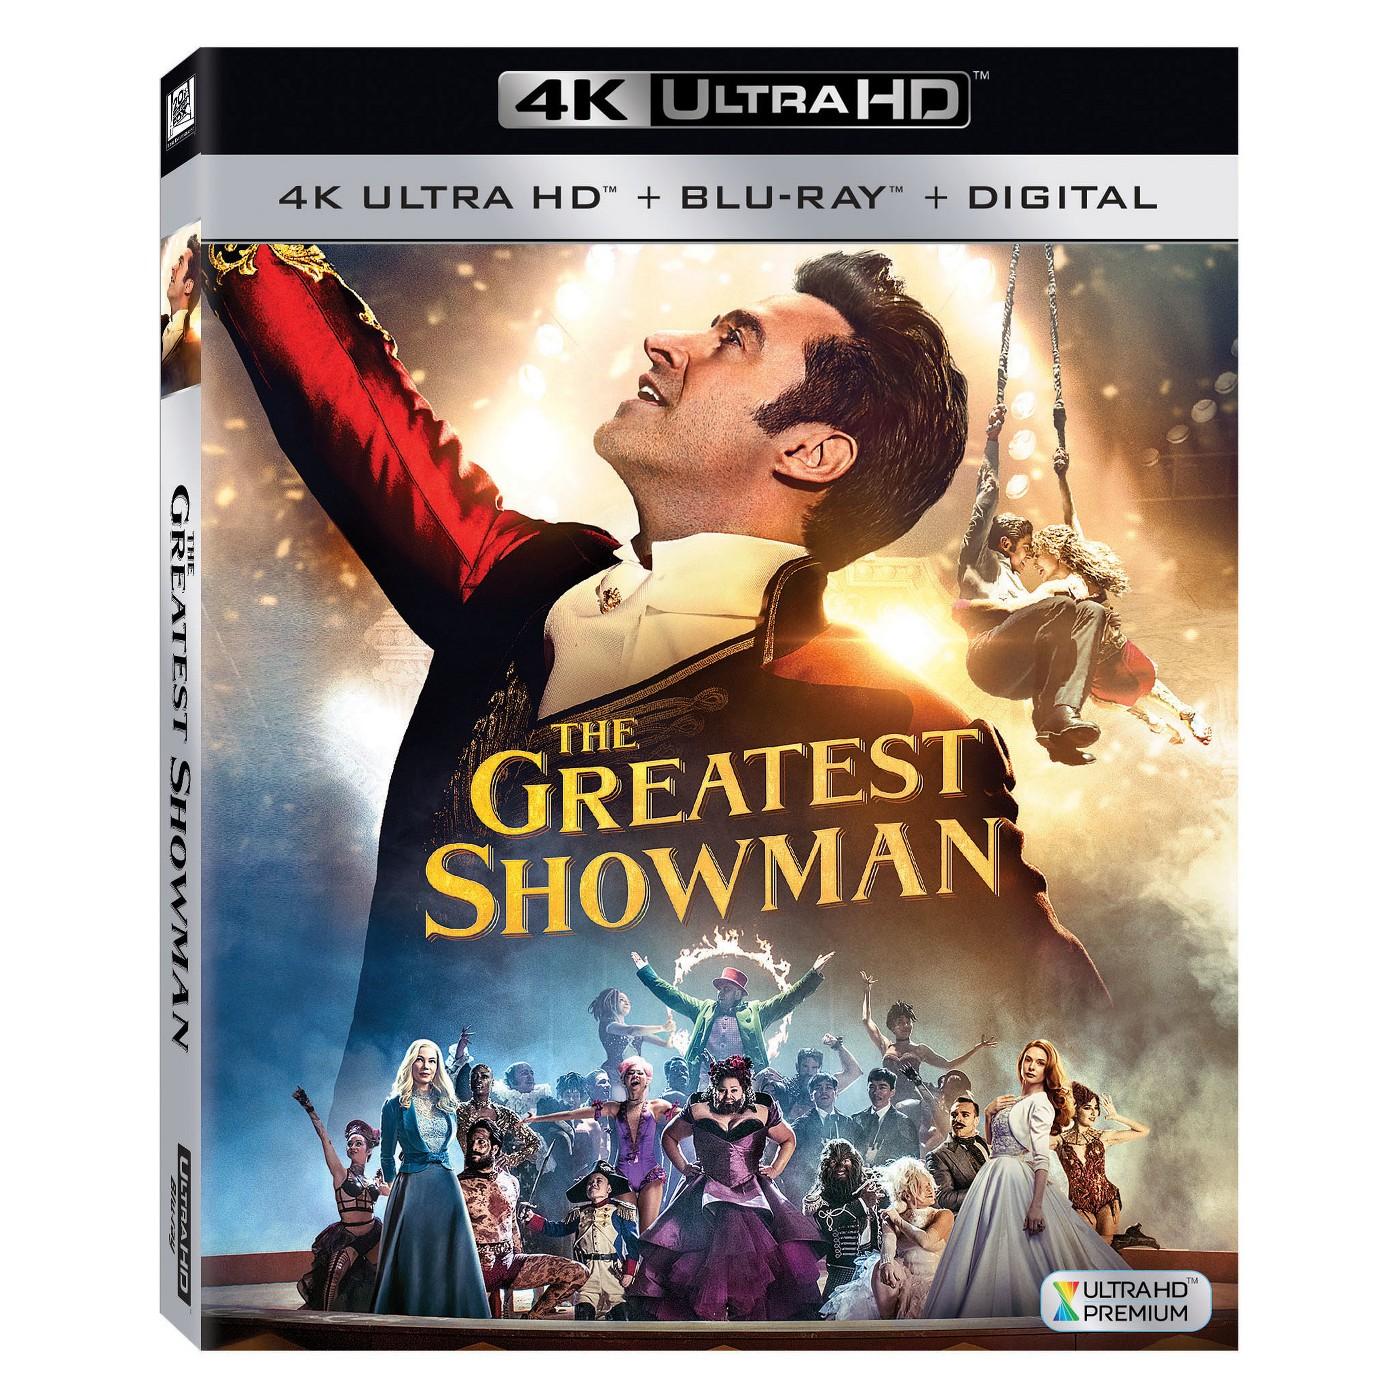 Greatest Showman 4k Ultra/ Blu-Ray + Digital (Target)  w/ rebate & Cartwheel